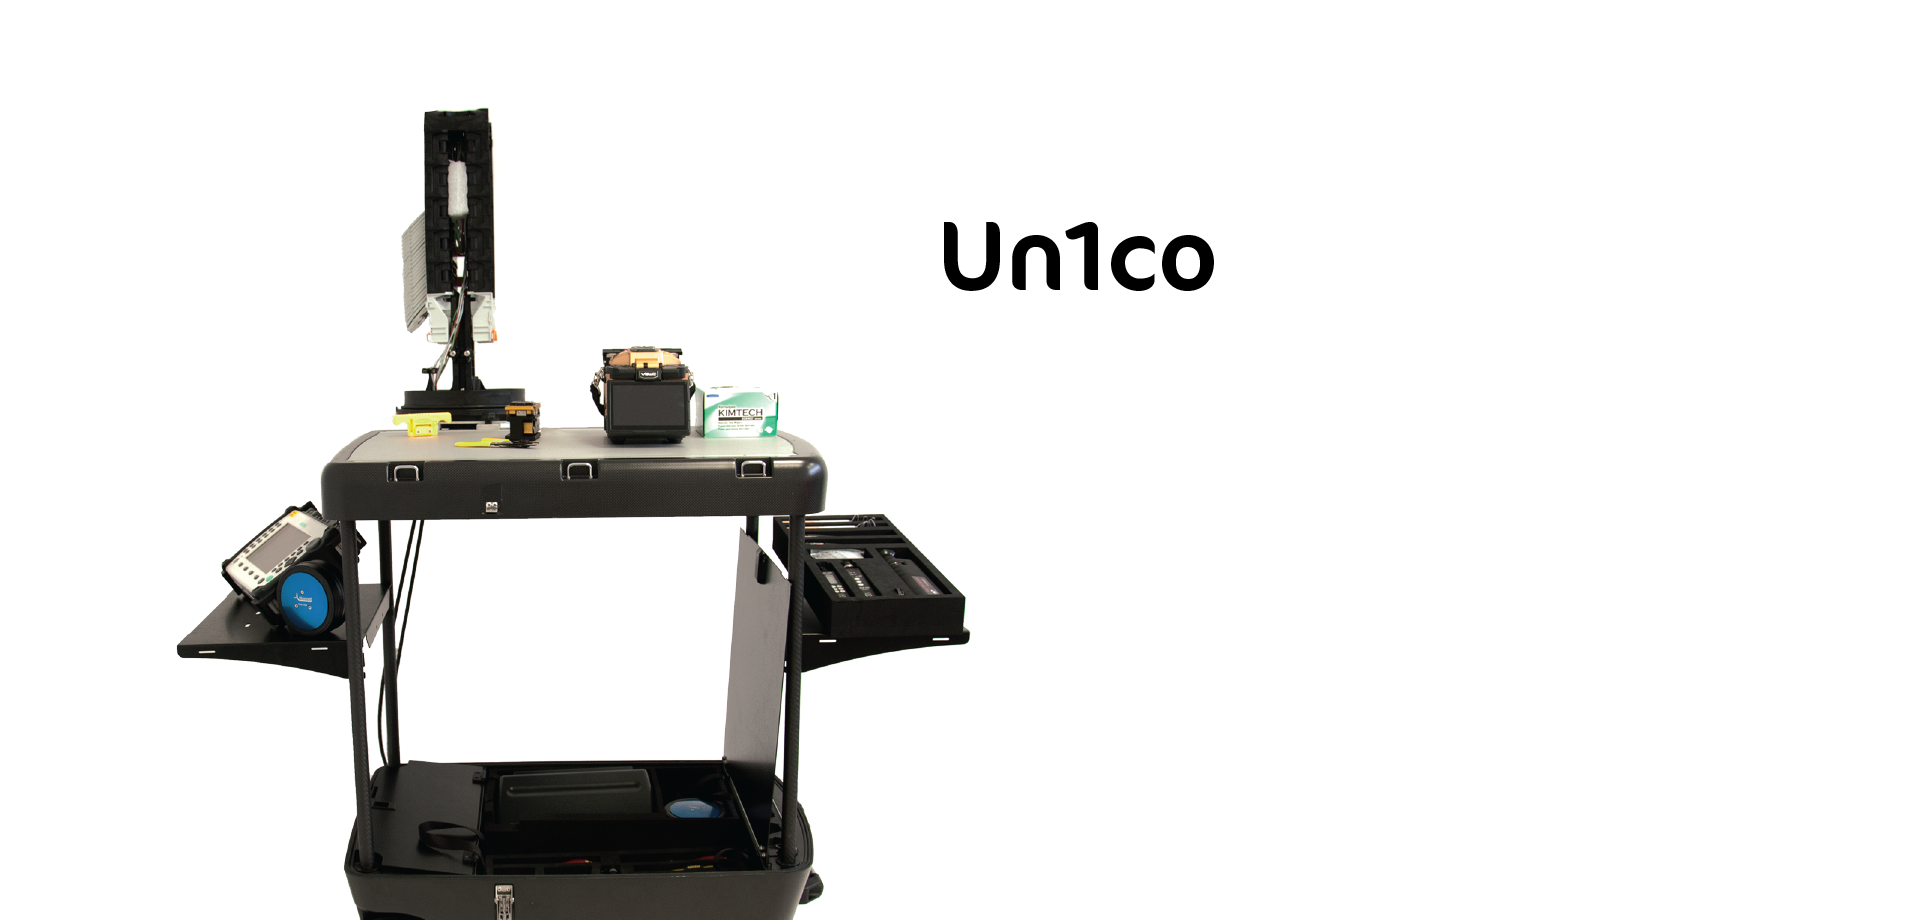 tavola-disegno-1